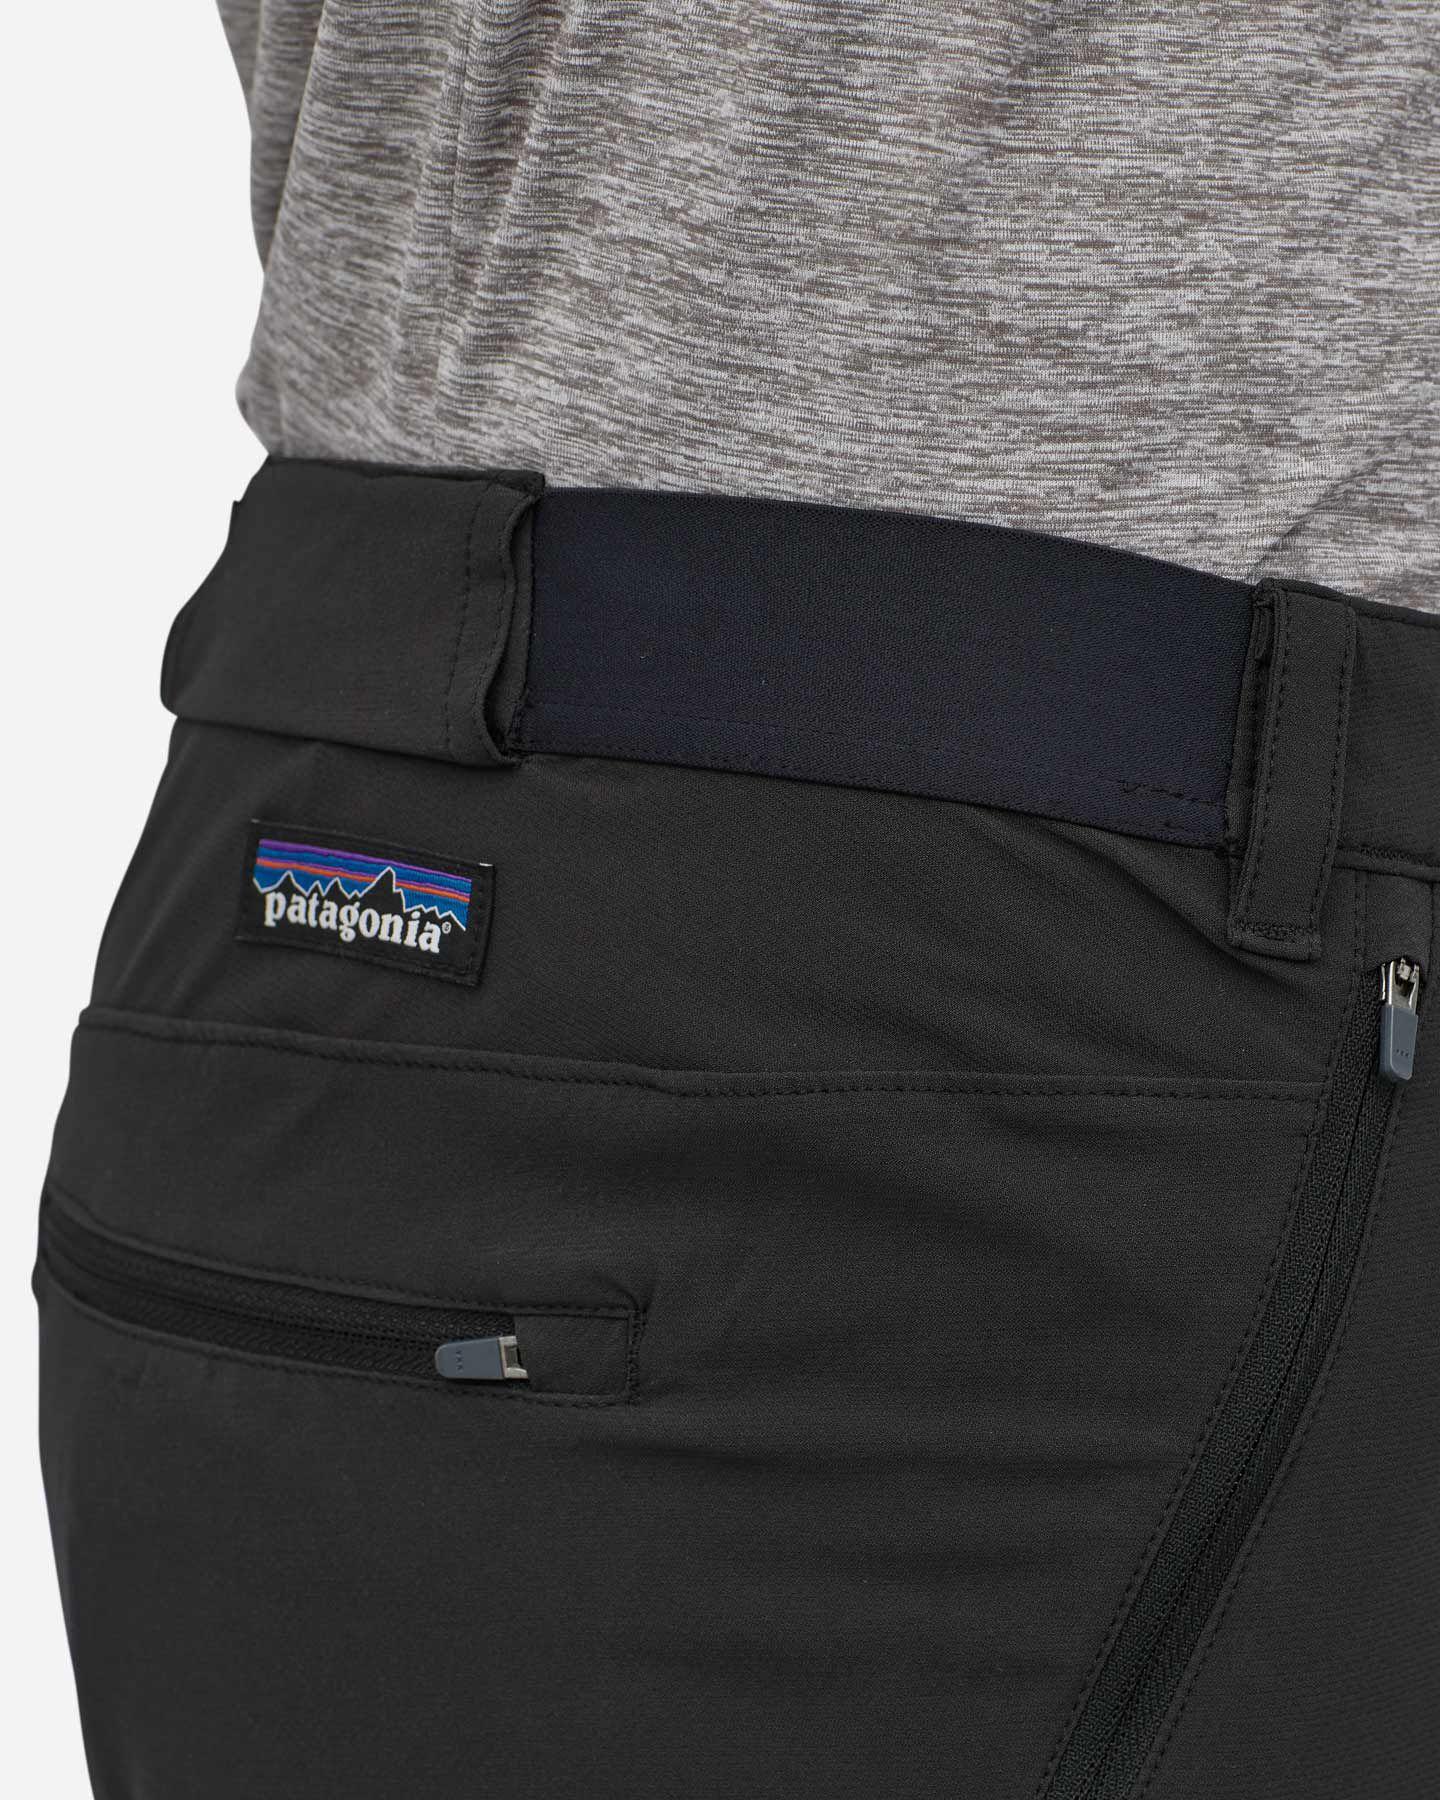 Pantalone outdoor PATAGONIA ALTVIA TRAIL M S4089232 scatto 4